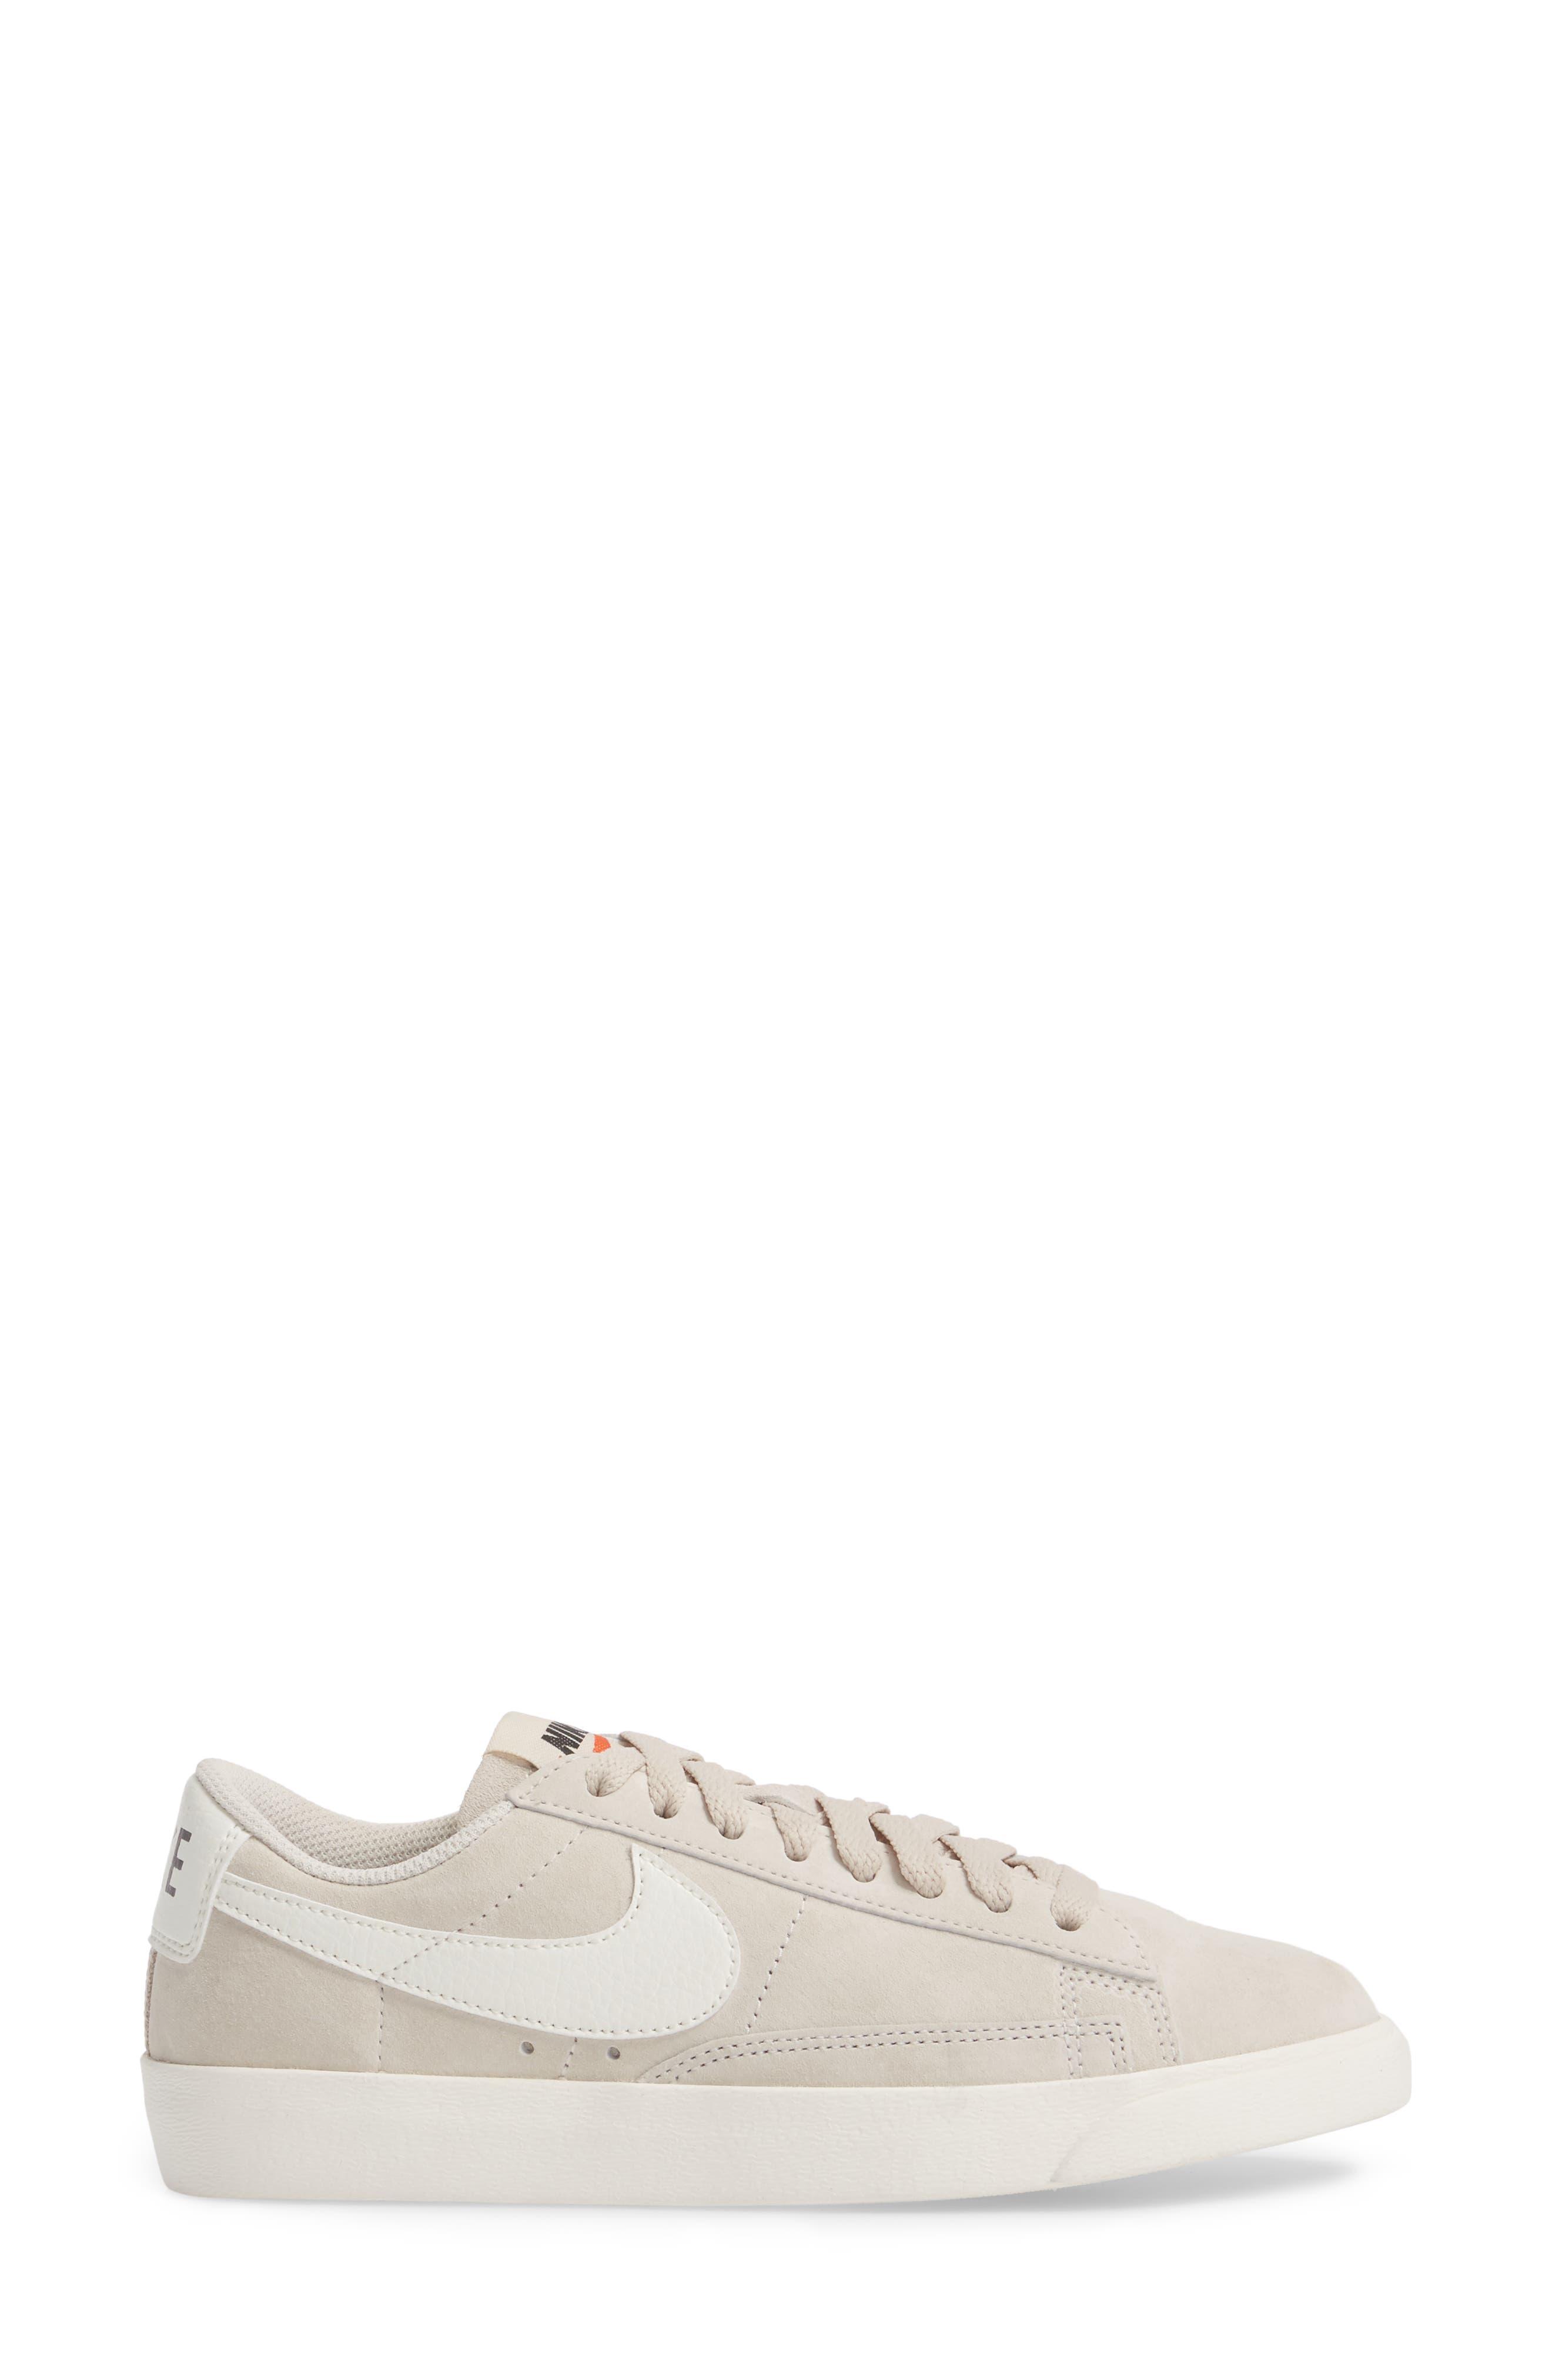 Blazer Low Sneaker,                             Alternate thumbnail 11, color,